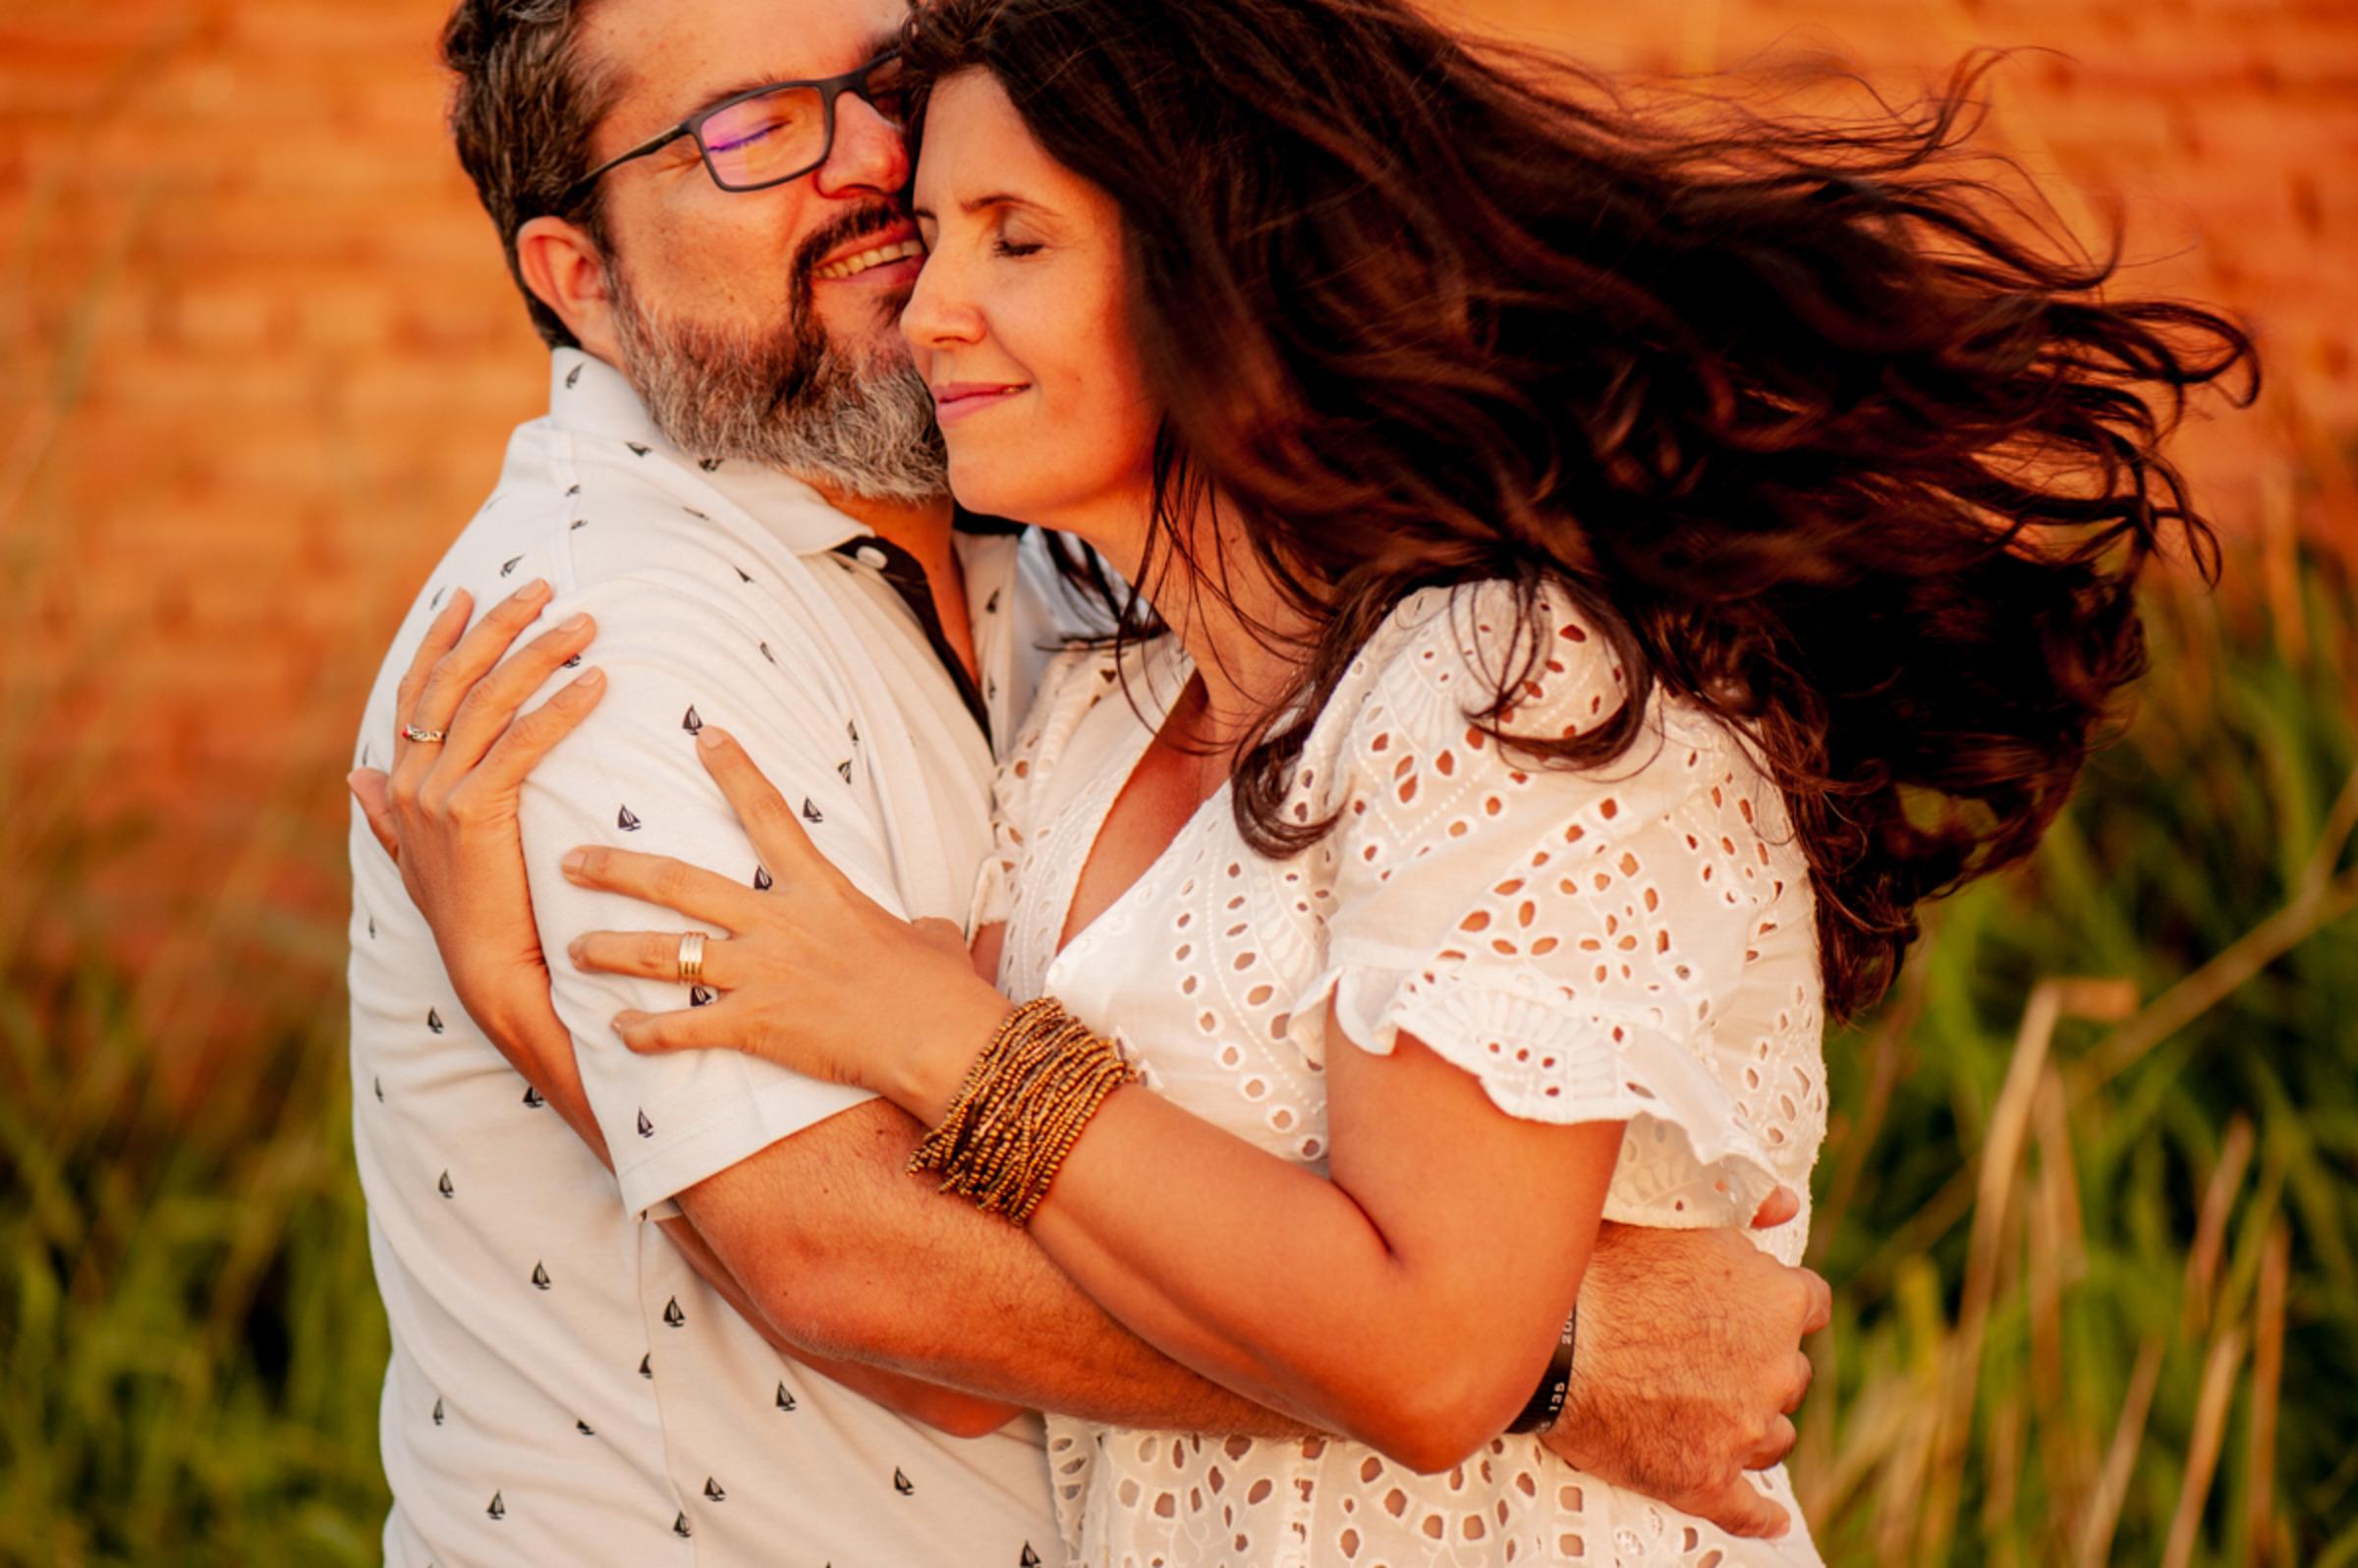 Sobre Marcelo Sousa Fotografias - Fotógrafo de casamento - MSousa Fotografias - fotógrafo de casamento Aracaju- SE